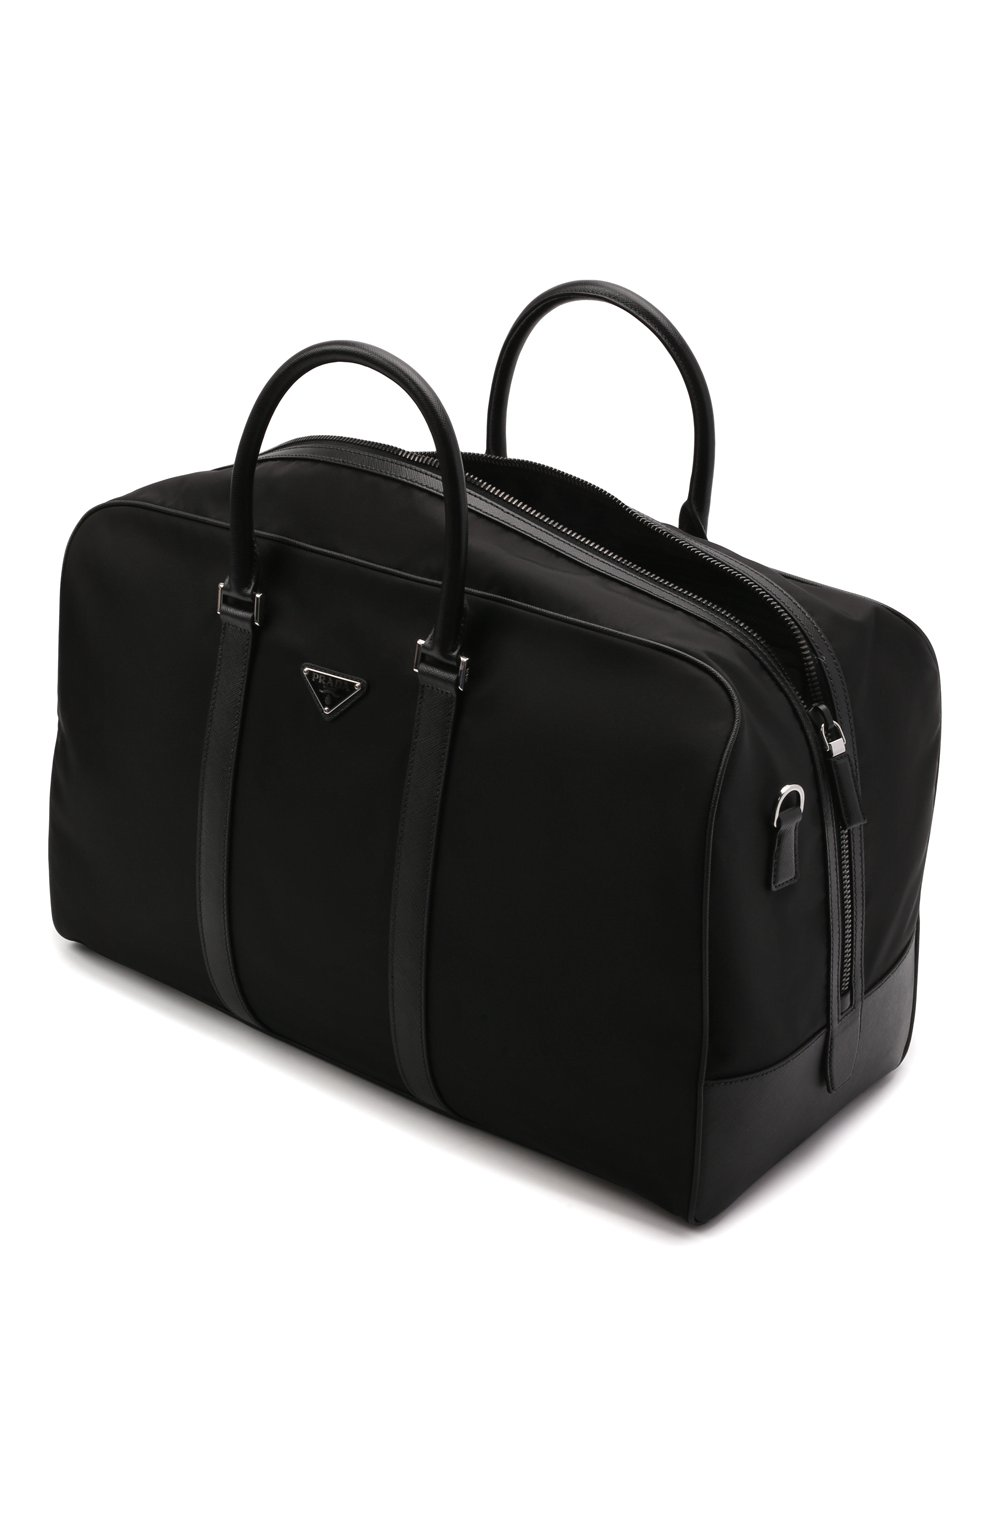 Мужская дорожная сумка PRADA черного цвета, арт. 2VC007-2DMH-F0002-SOO | Фото 4 (Материал: Текстиль)